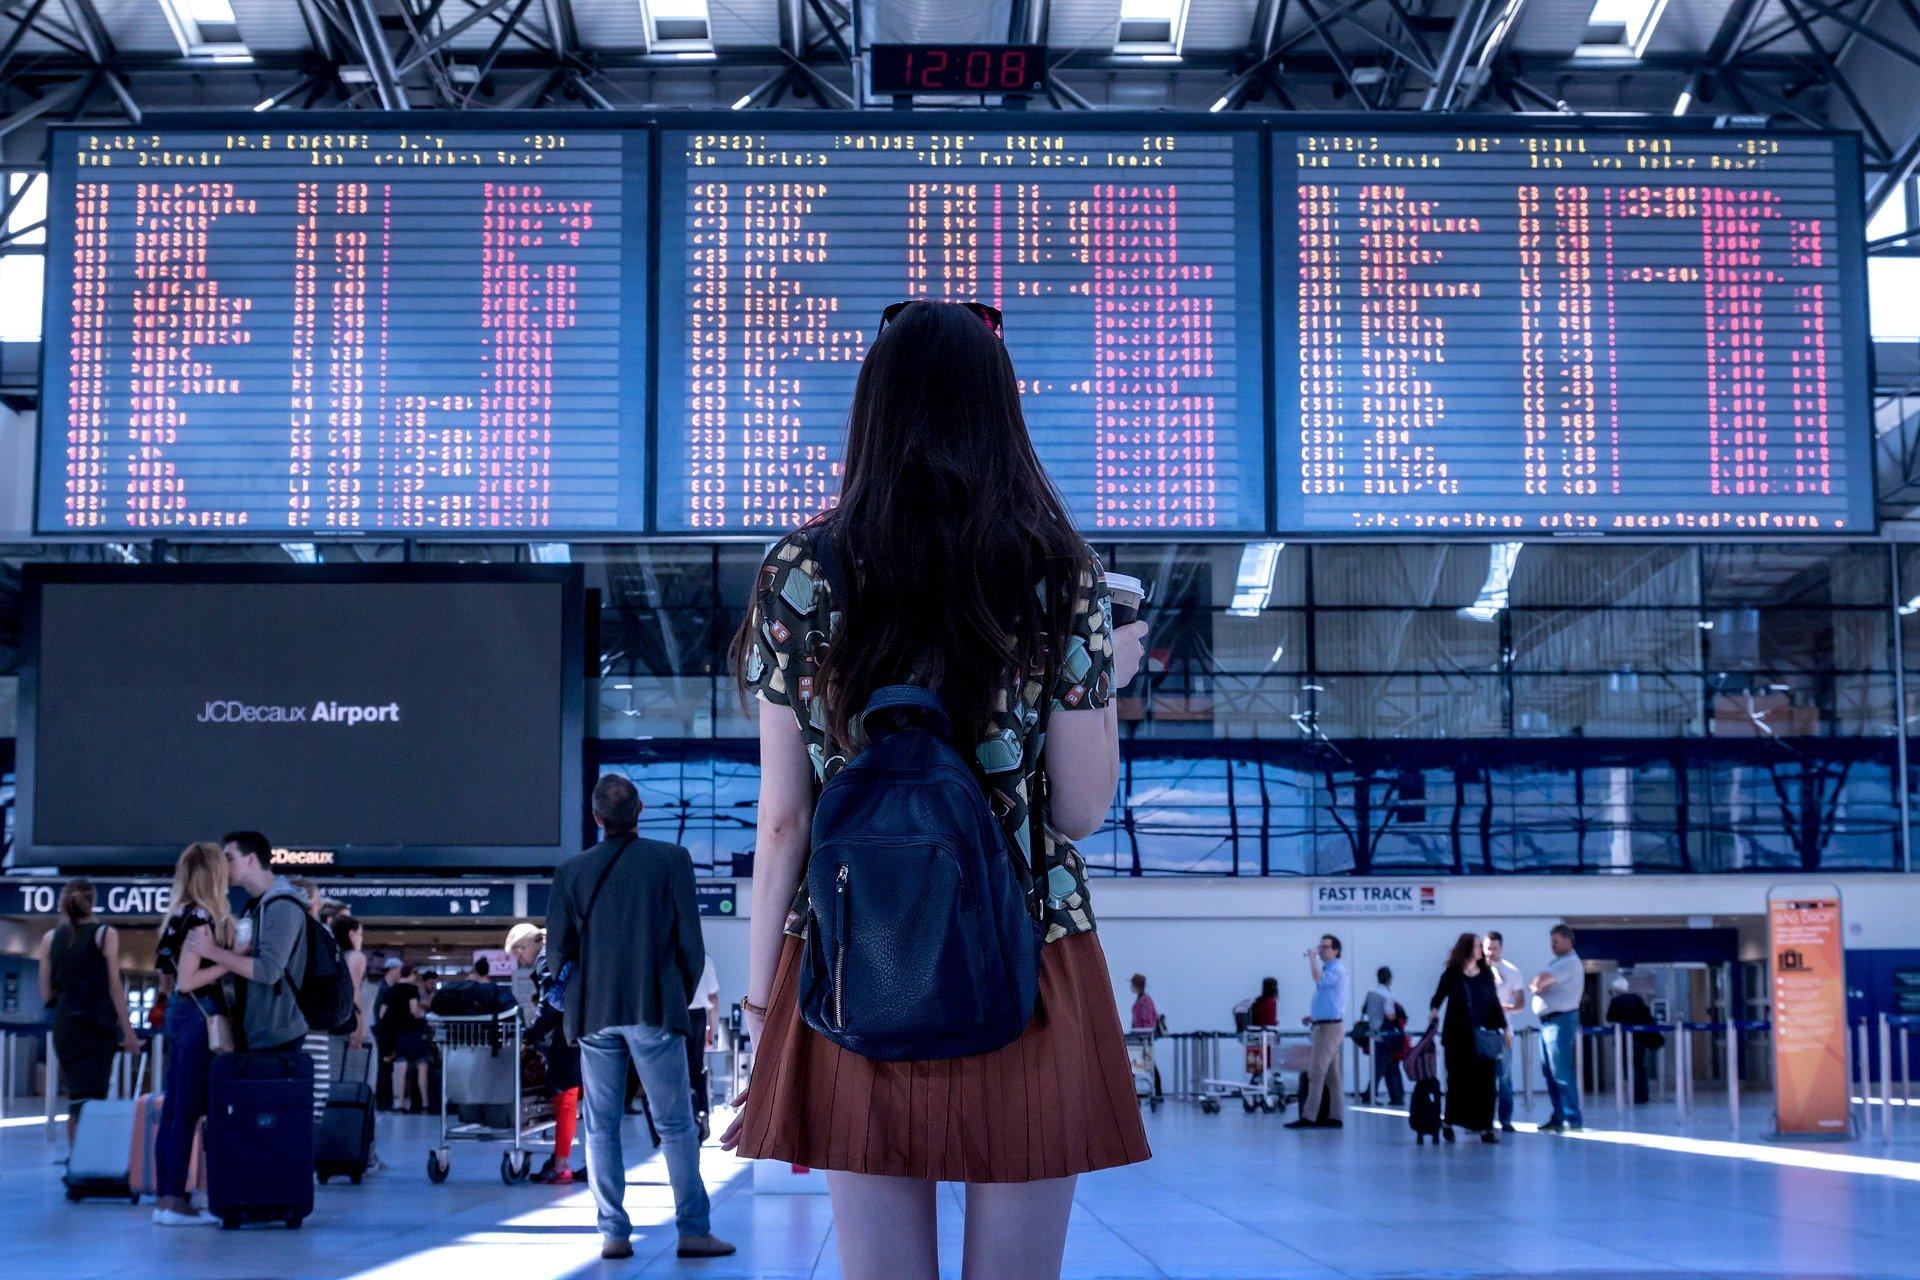 girl departure boards